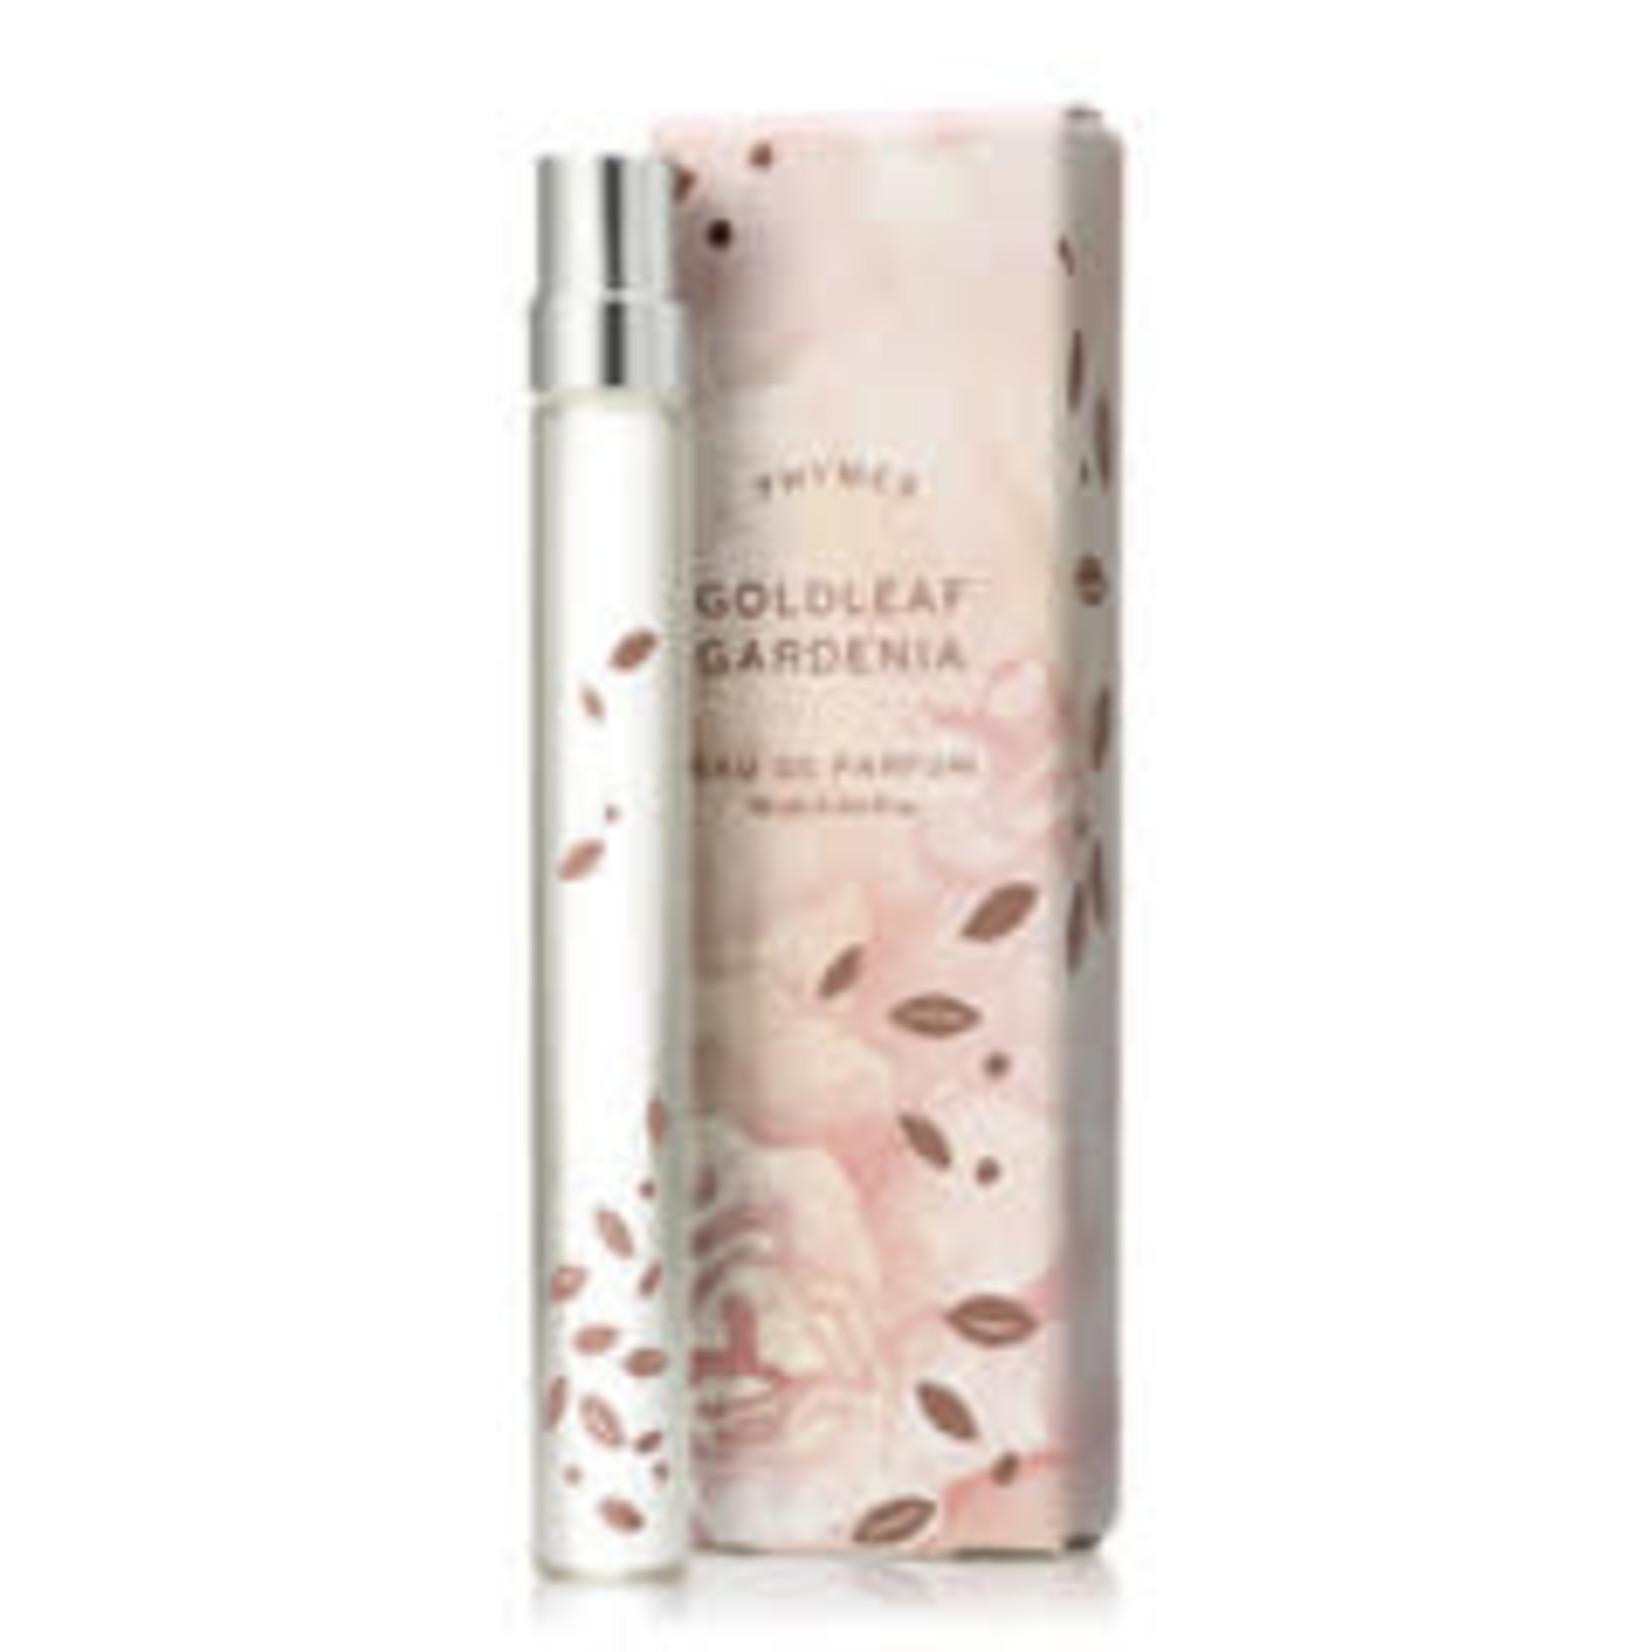 Thymes Mini Perfume 10ml